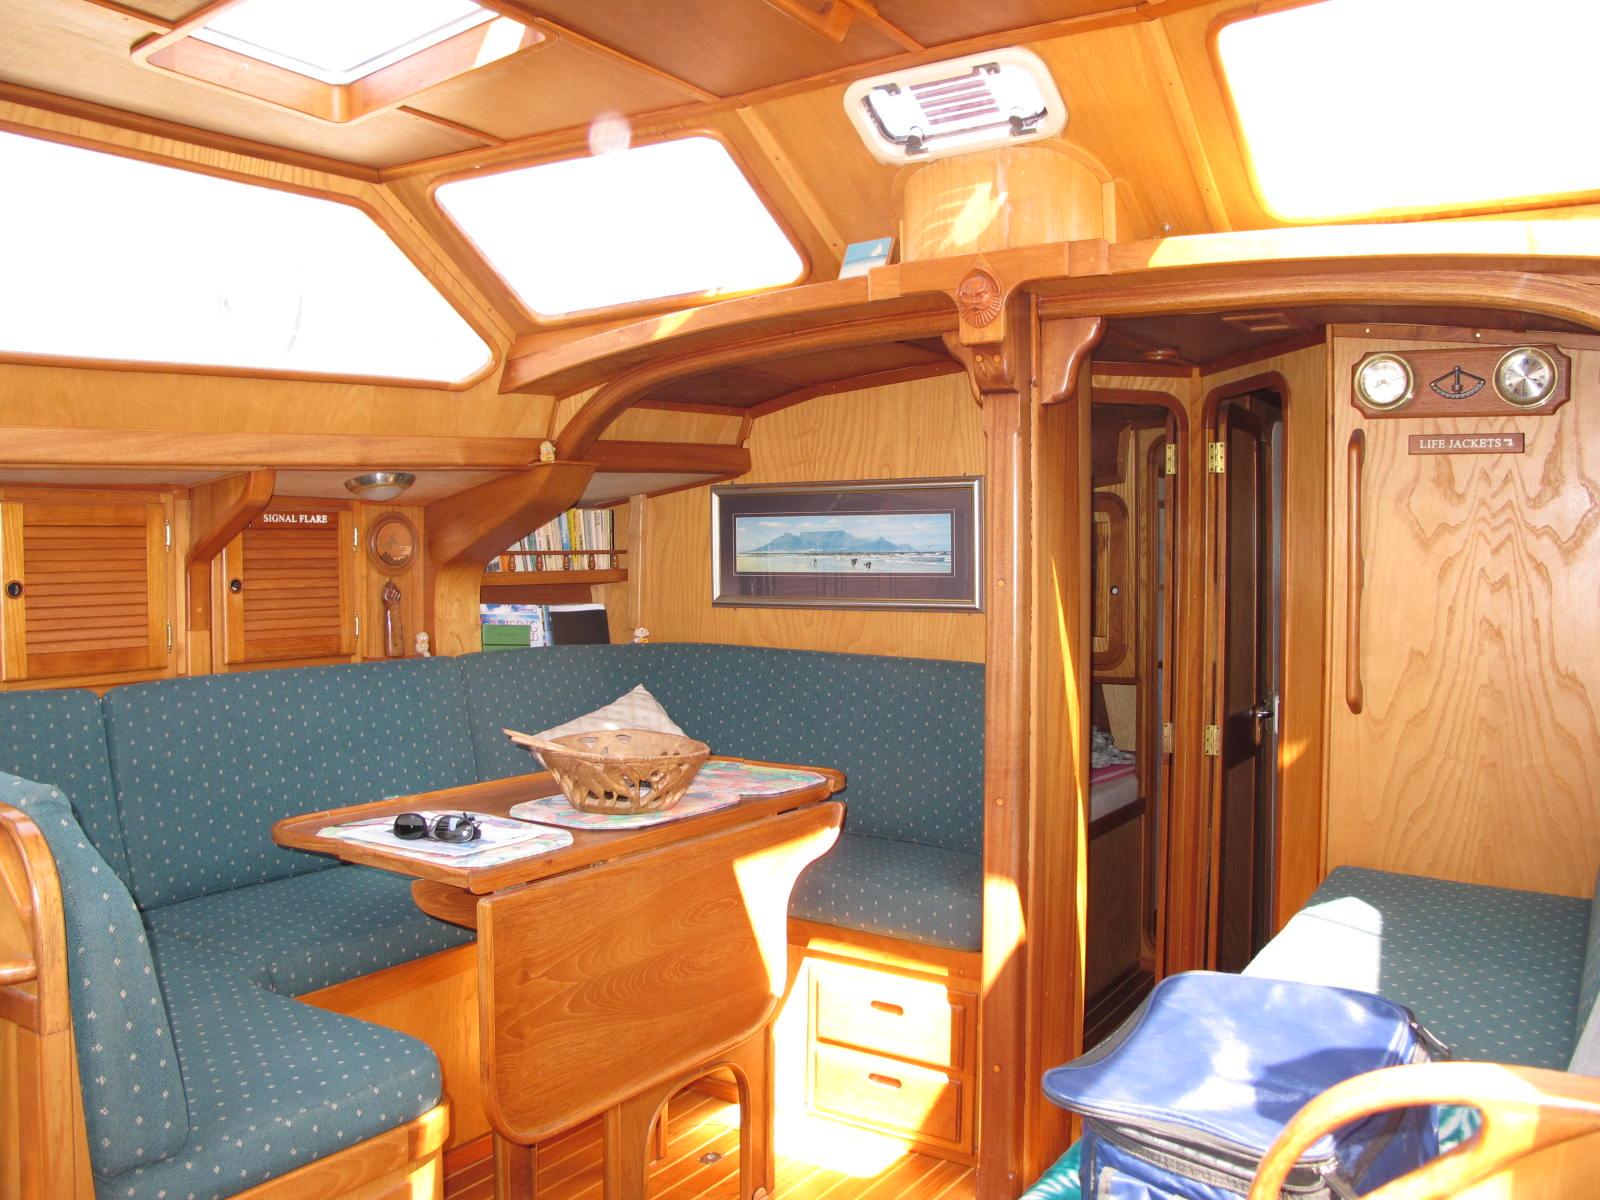 Ckd Boats Roy Mc Bride Inside A Wooden Boat